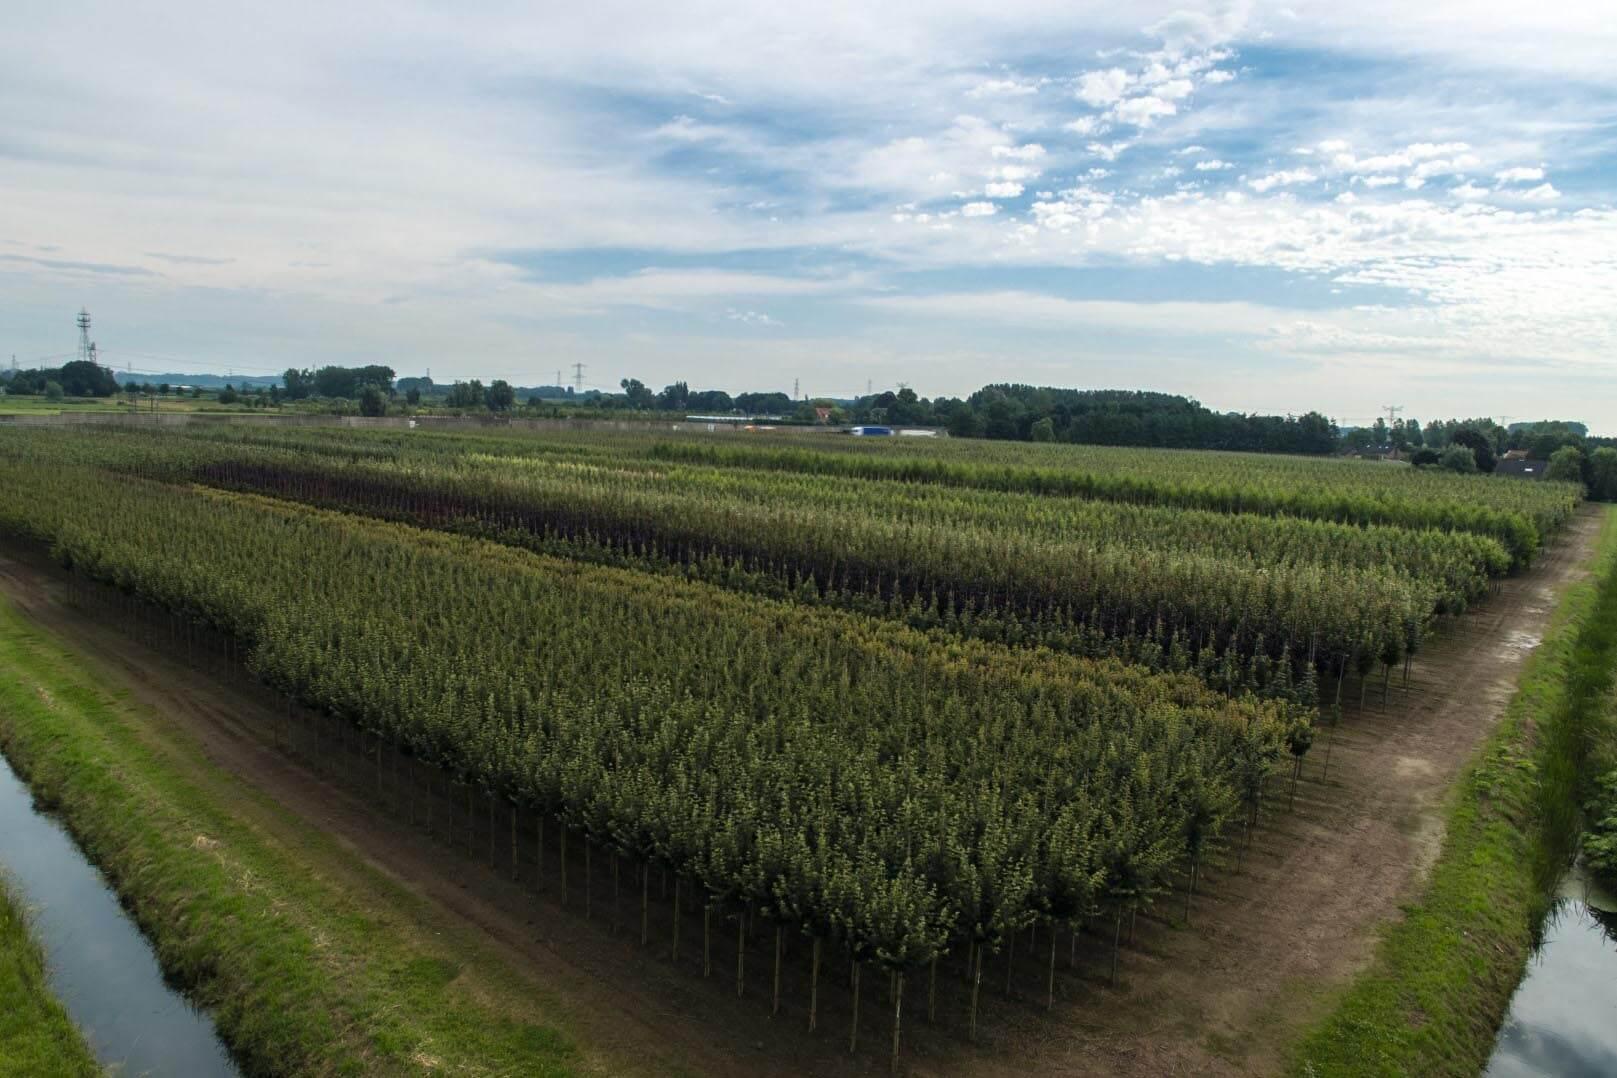 Maizählung per Drohne